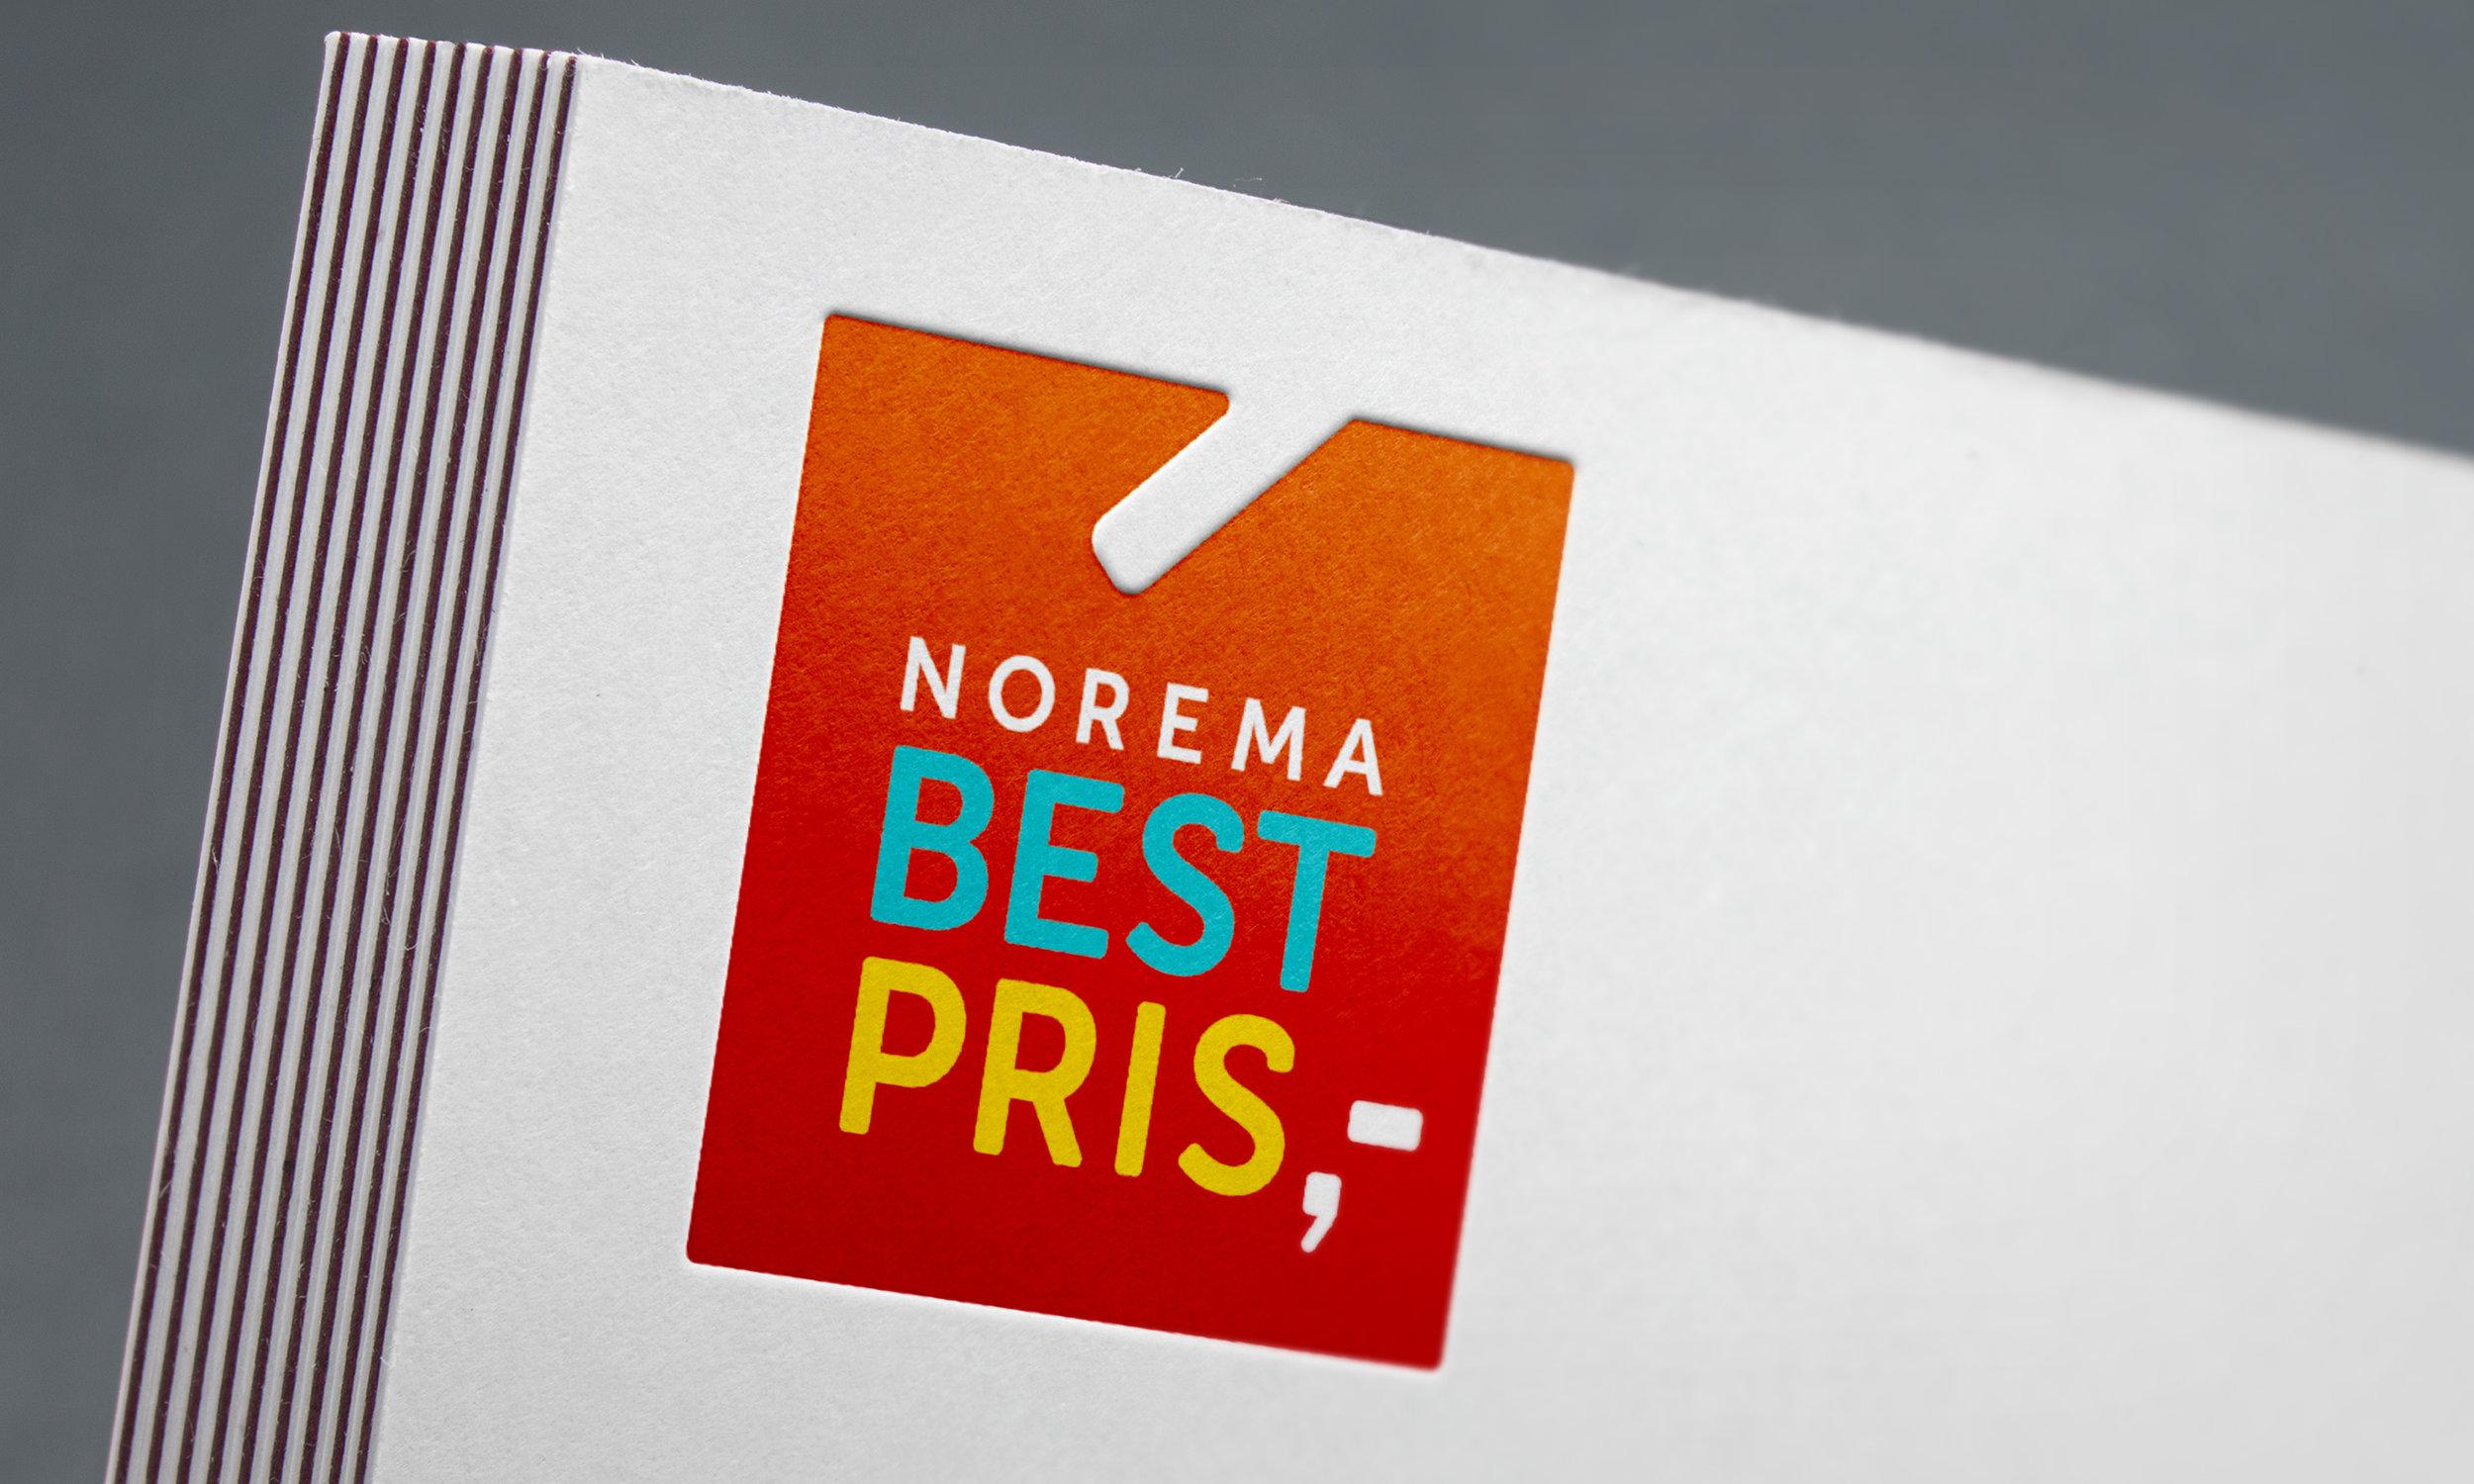 GD-1-Norema-Best-Pris-3.jpg